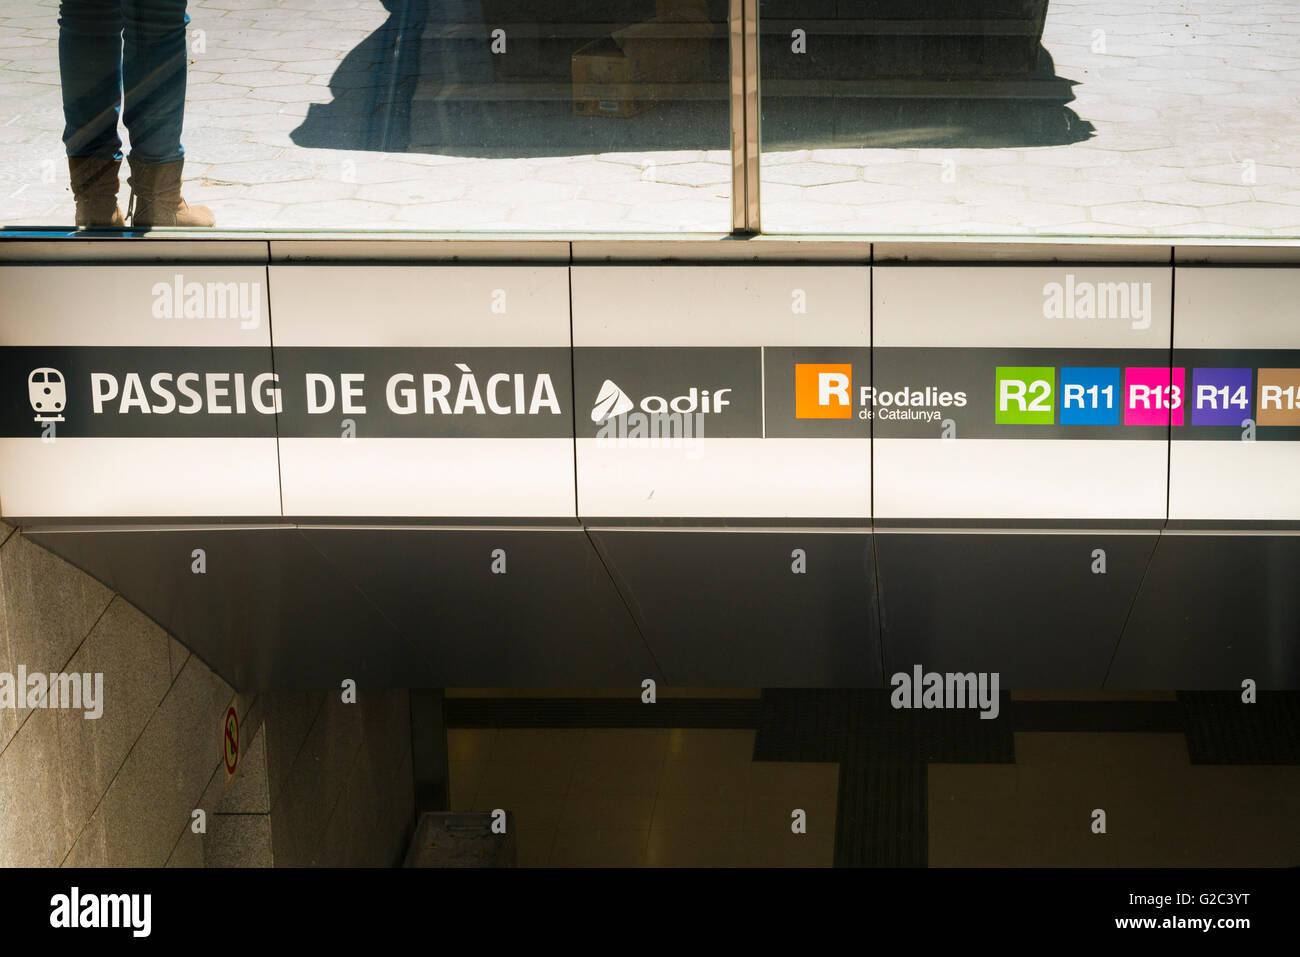 Spain Catalonia Barcelona Eixample Passeig de Gracia Metro subway underground station entrance sign signs scene - Stock Image